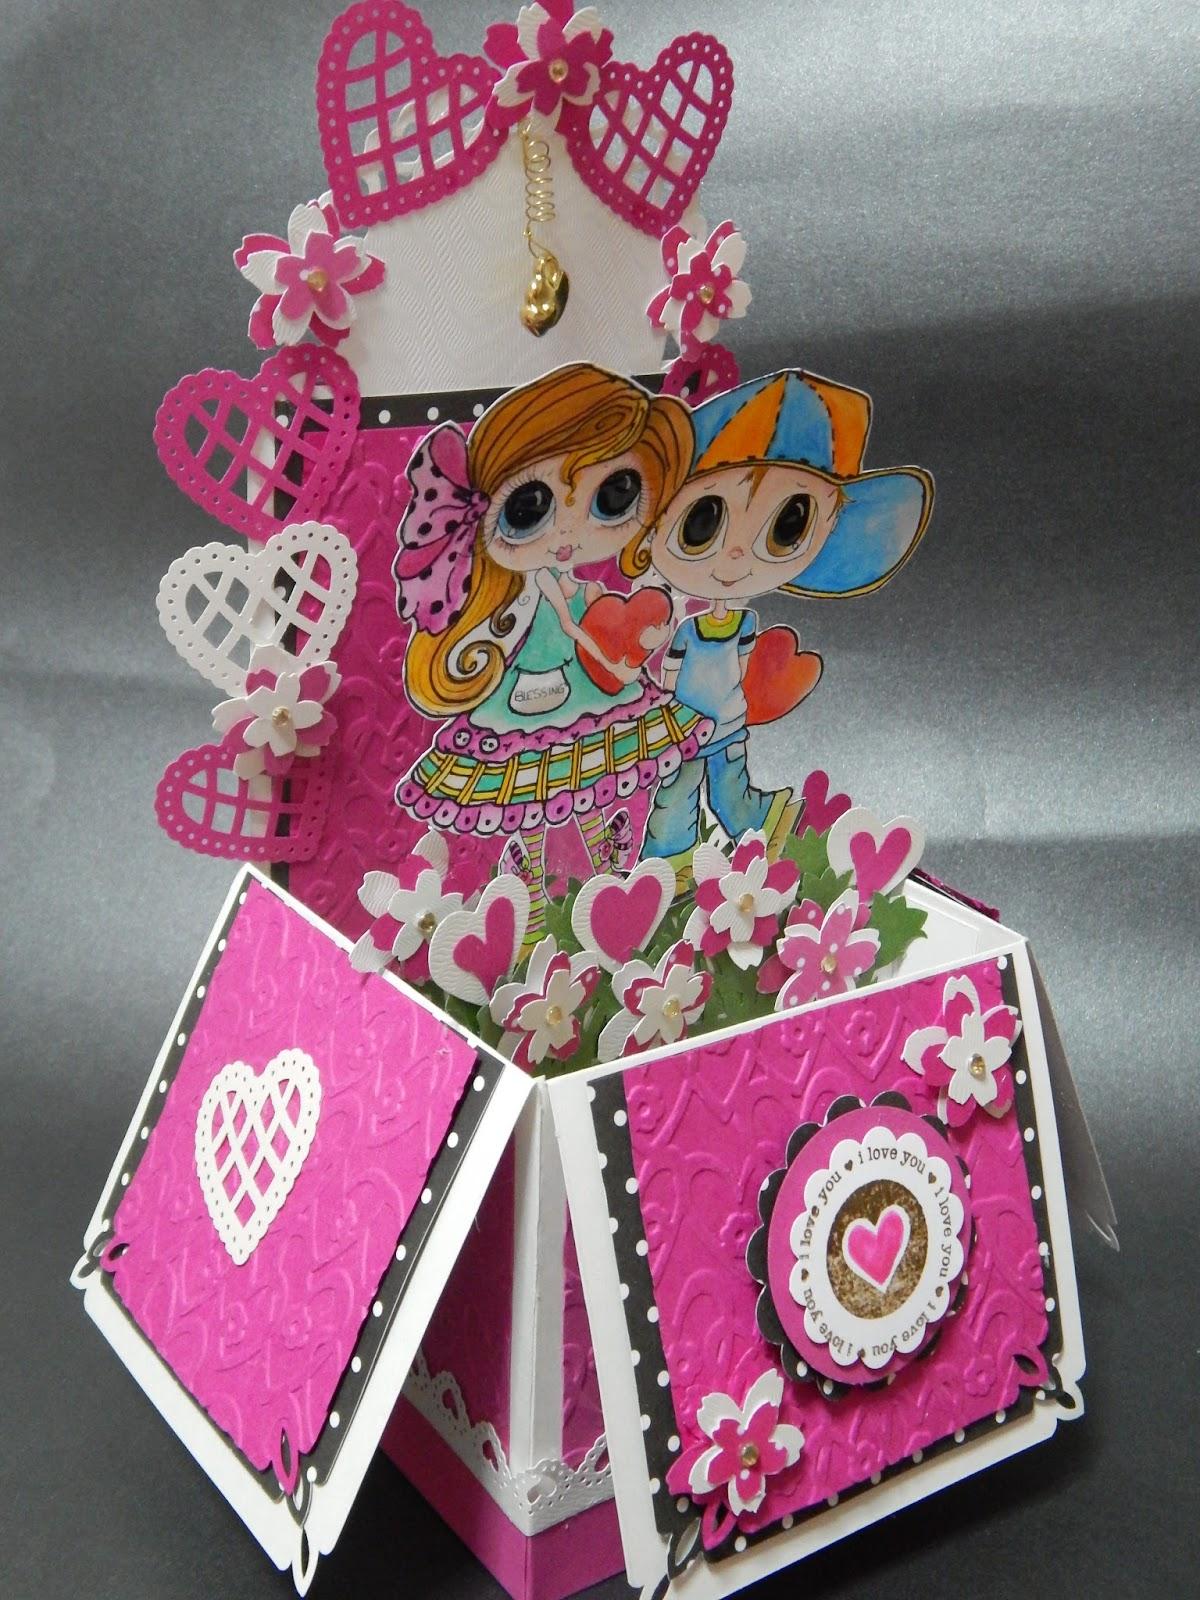 Arte con papel madera e hilos caja sorpresa san valentin - Sorpresas para san valentin originales ...